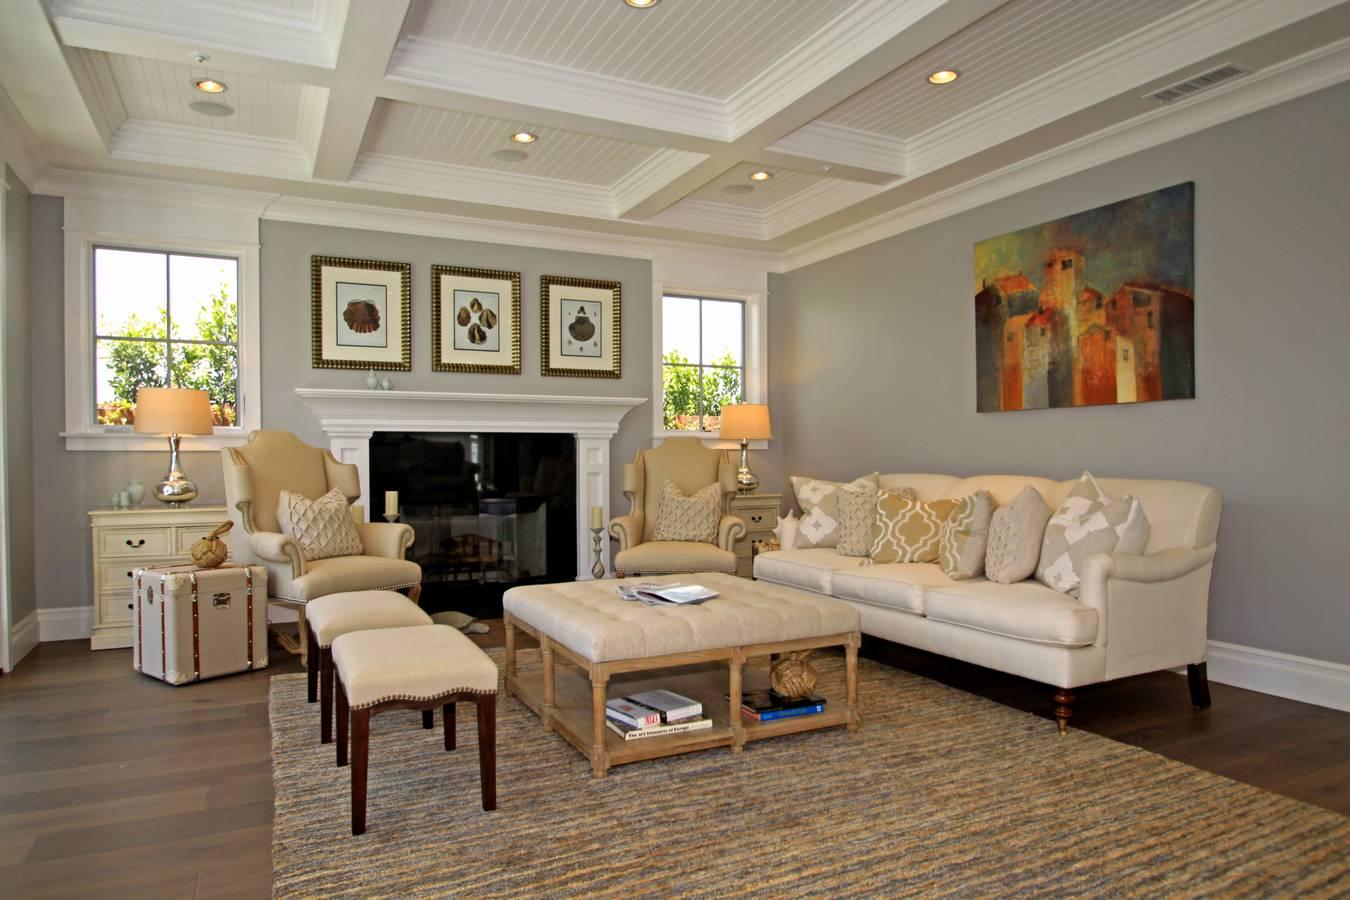 42 inspiring modern open living room design ideas 7 in